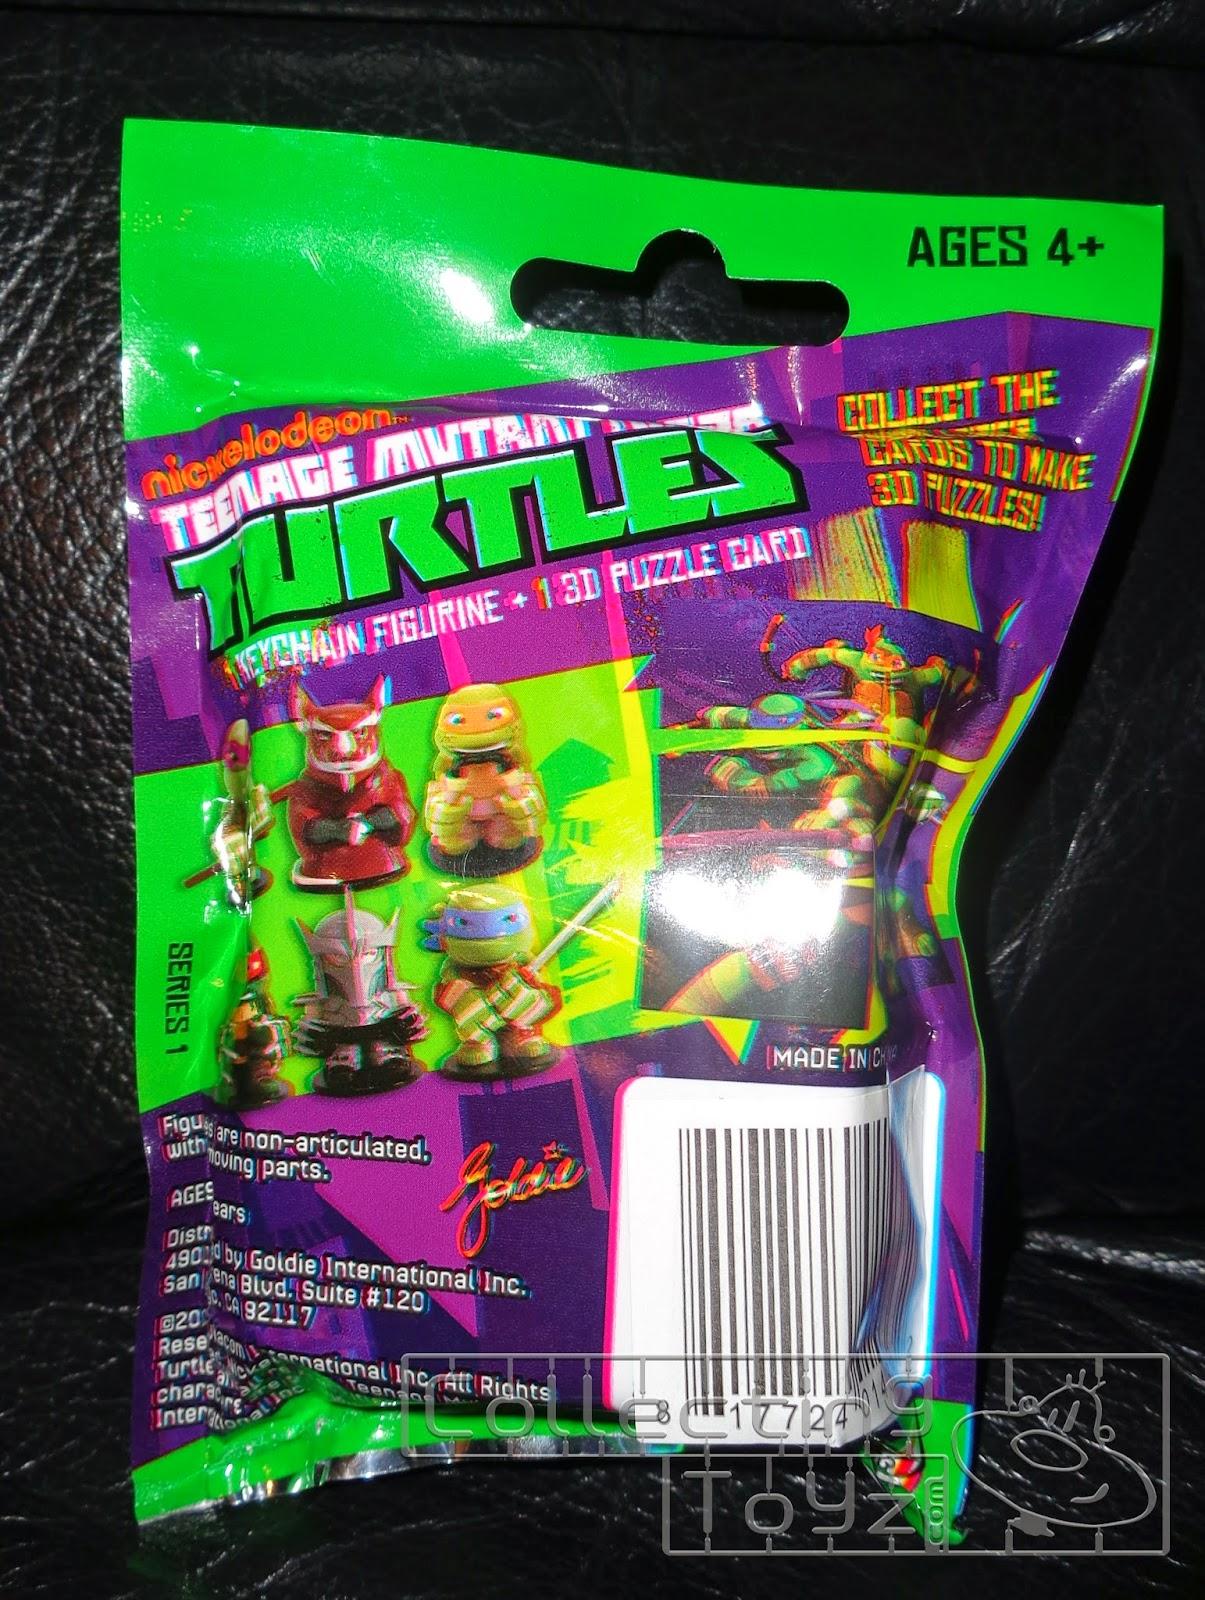 collecting toyz teenage mutant ninja turtles keychain figurine